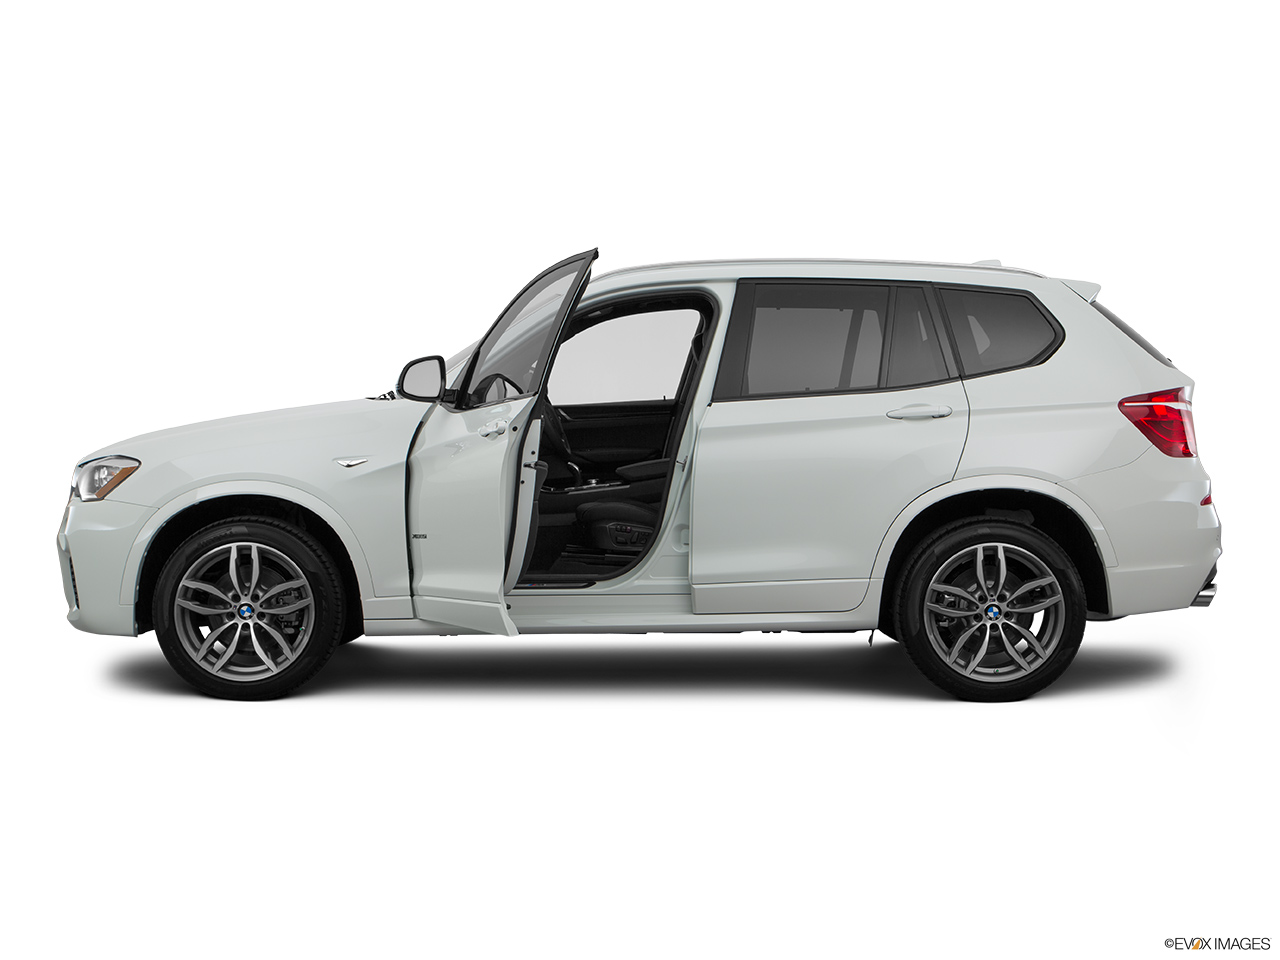 car features list for bmw x3 2017 xdrive 35i uae yallamotor. Black Bedroom Furniture Sets. Home Design Ideas